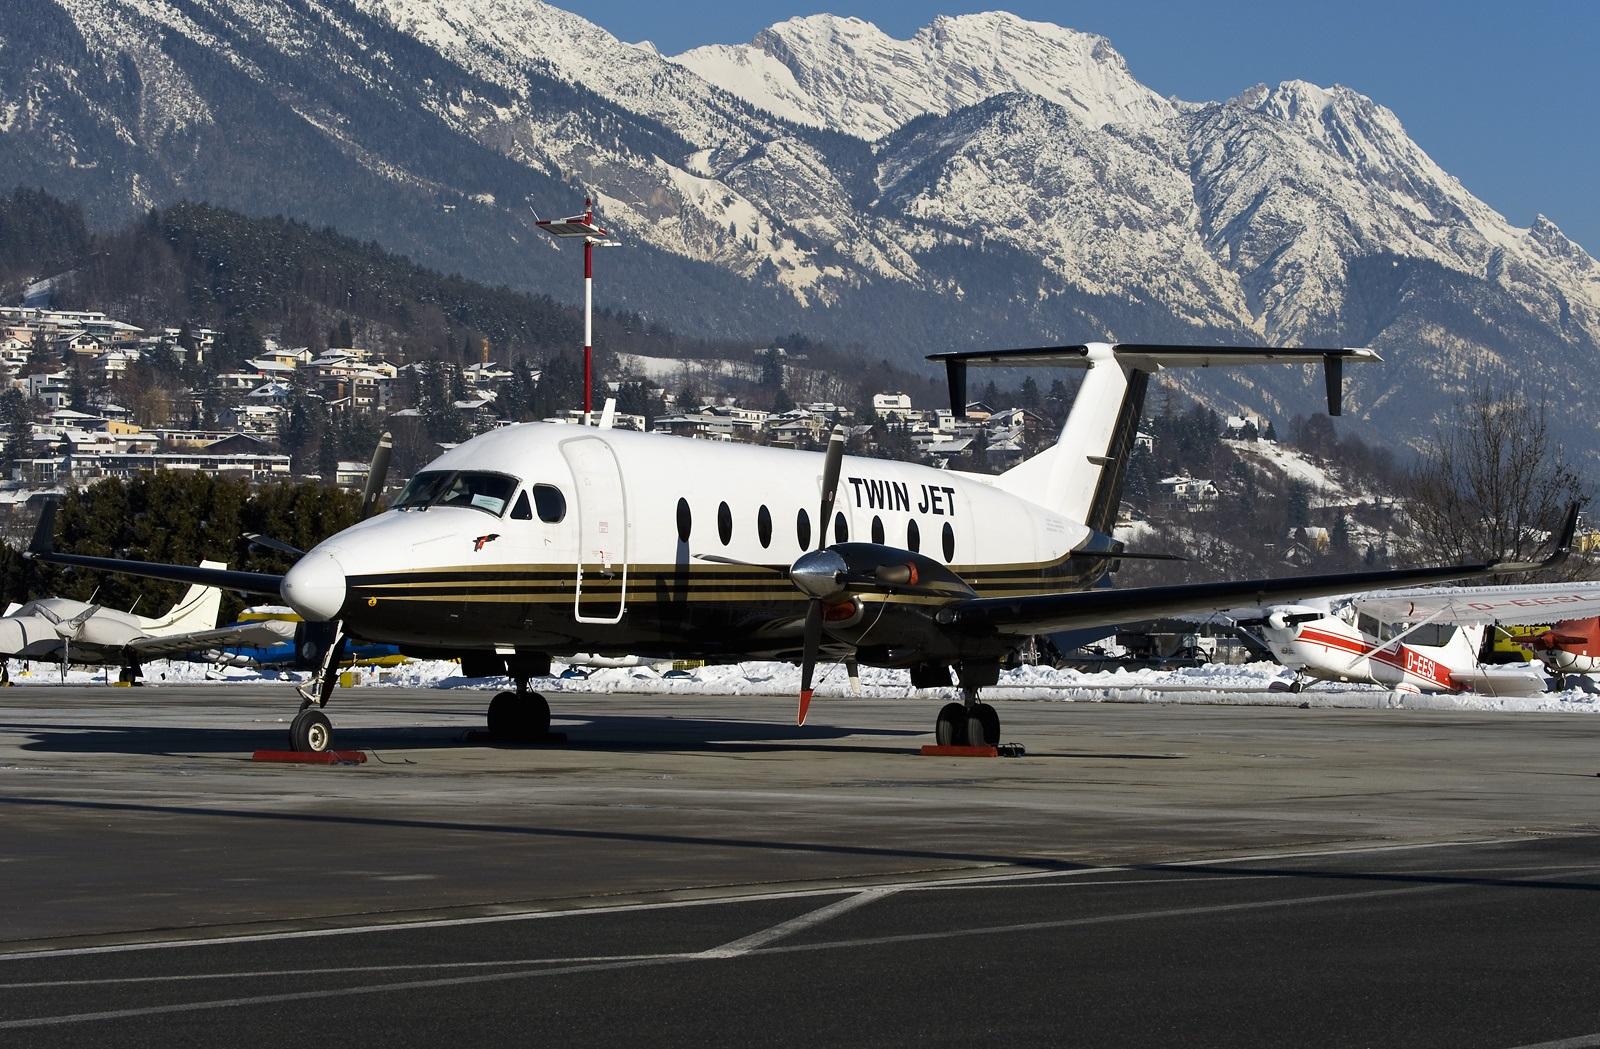 Самолет компании Twin Jet в аэропорту